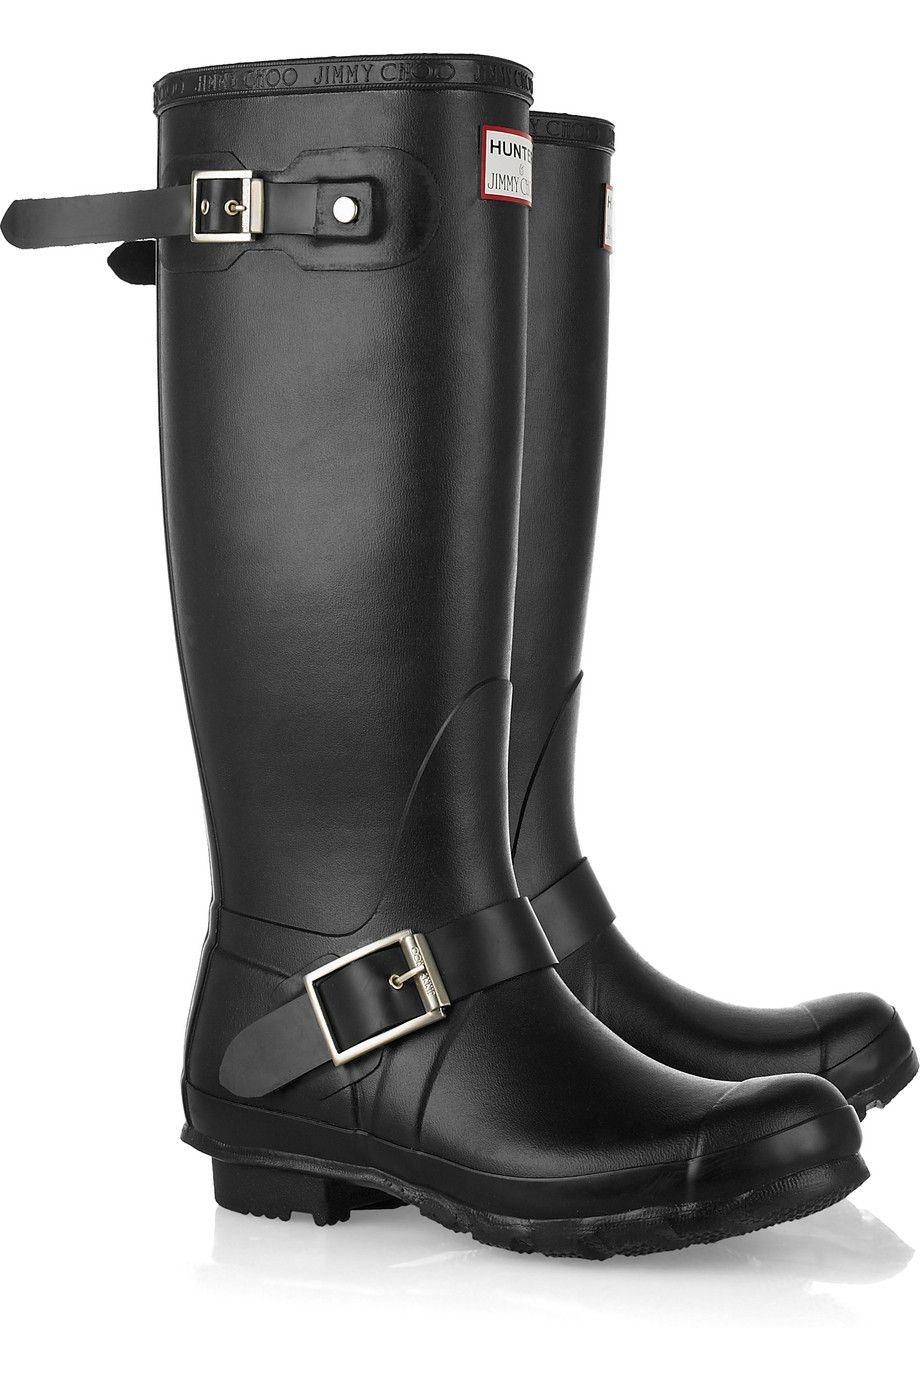 53a12fde63f JIMMY CHOO- Biker Wellington boots- so fantastic, but SOO expensive ...